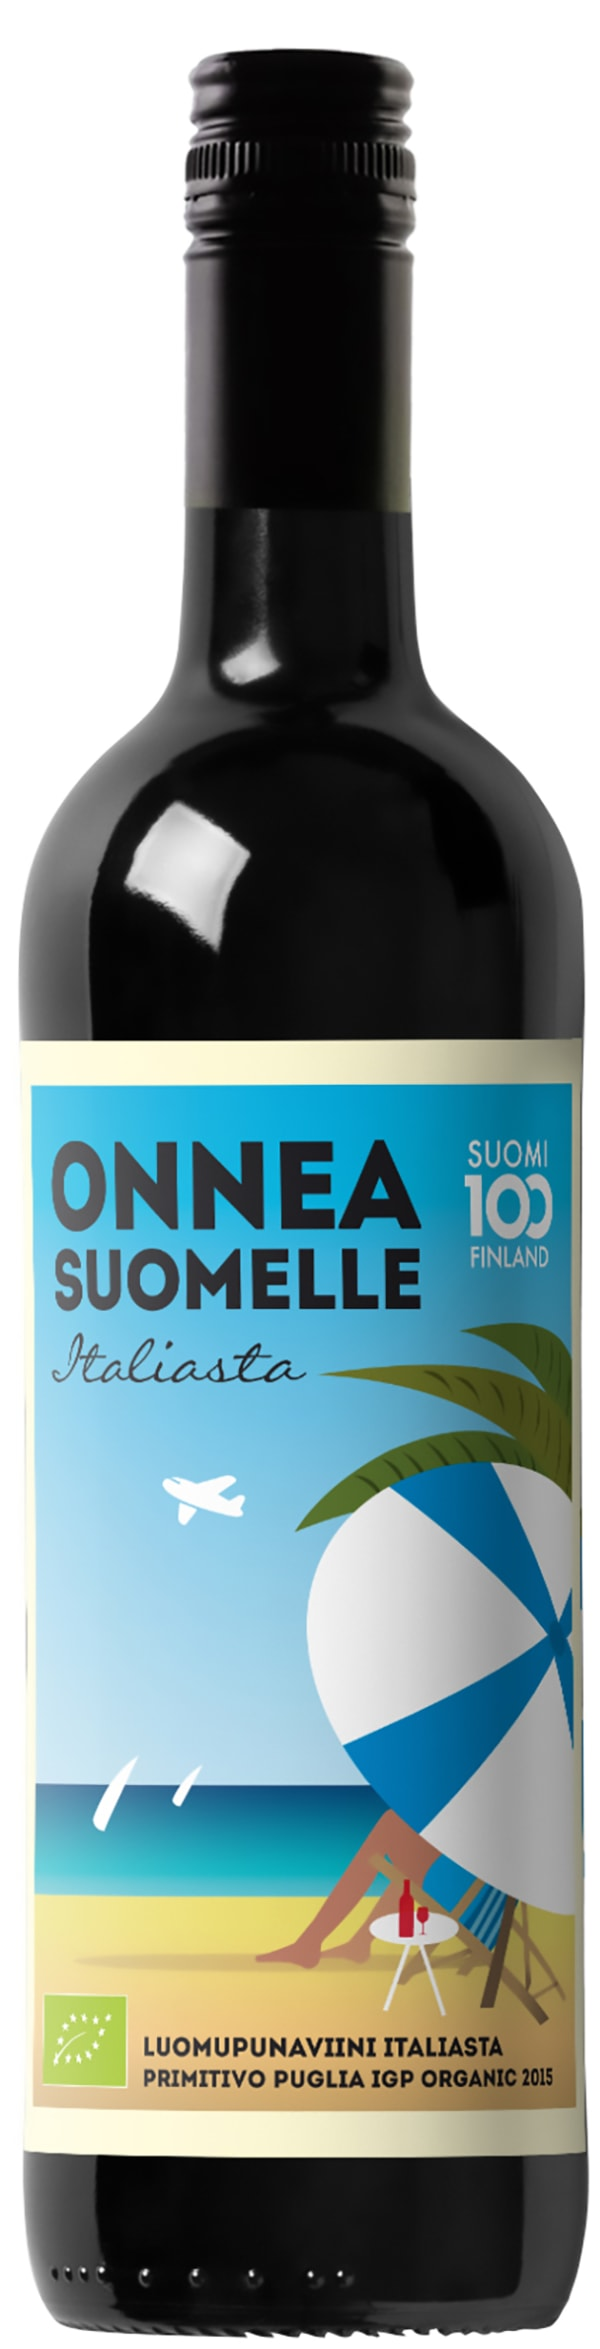 Onnea Suomelle Italiasta Organic Primitivo 2015